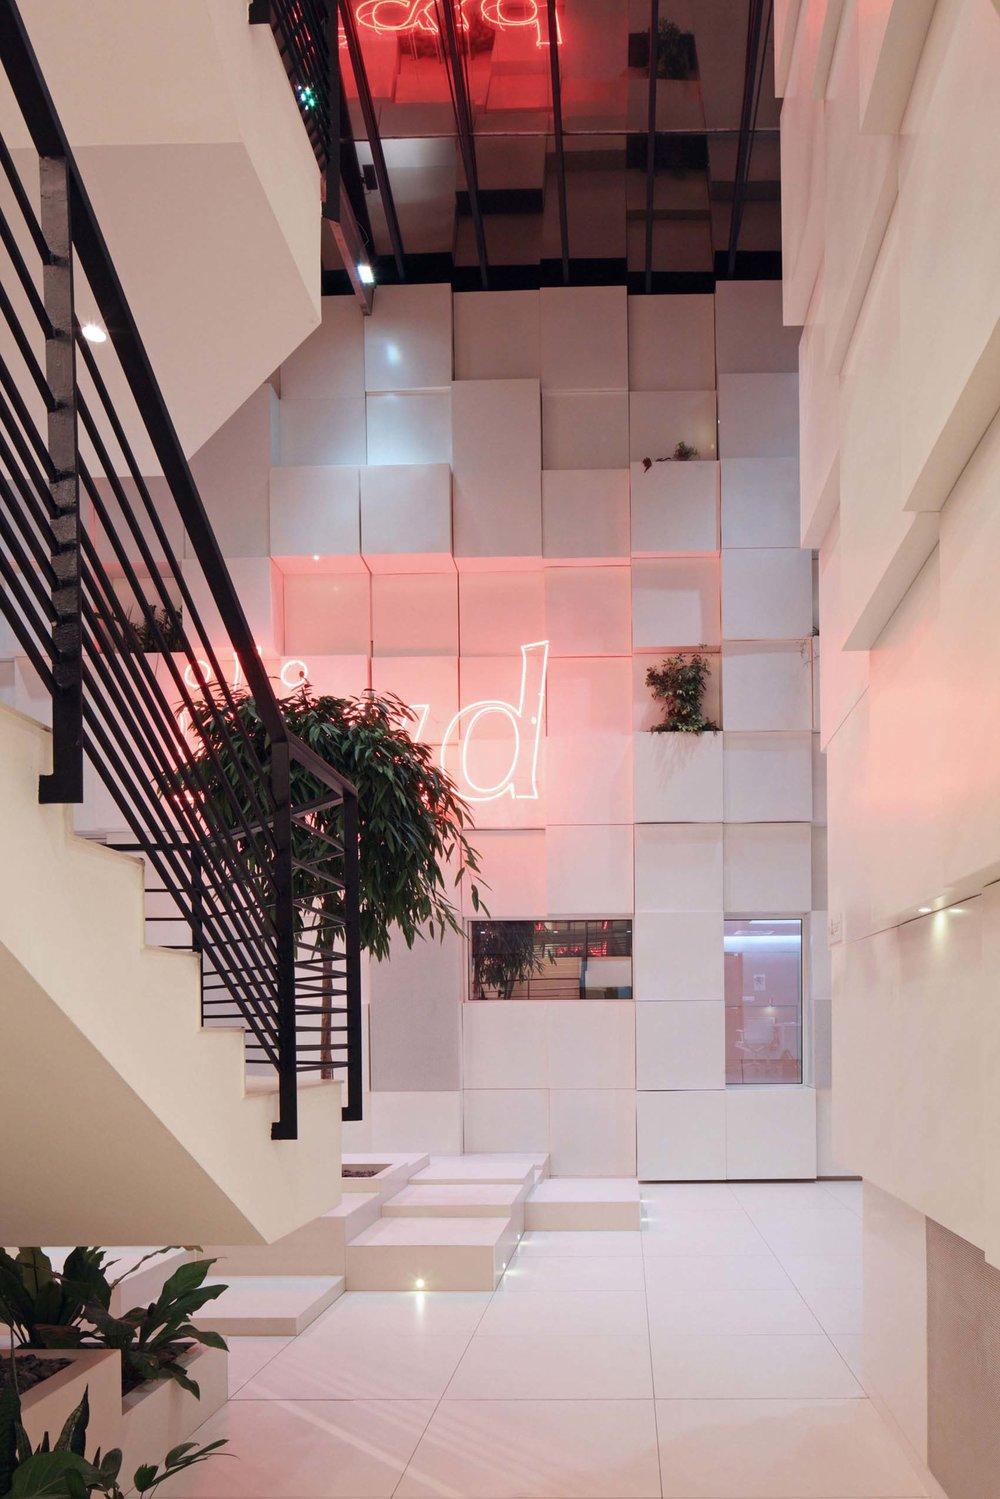 DC3 data center illiad xavier niel ar studio d'architectures (5).jpg